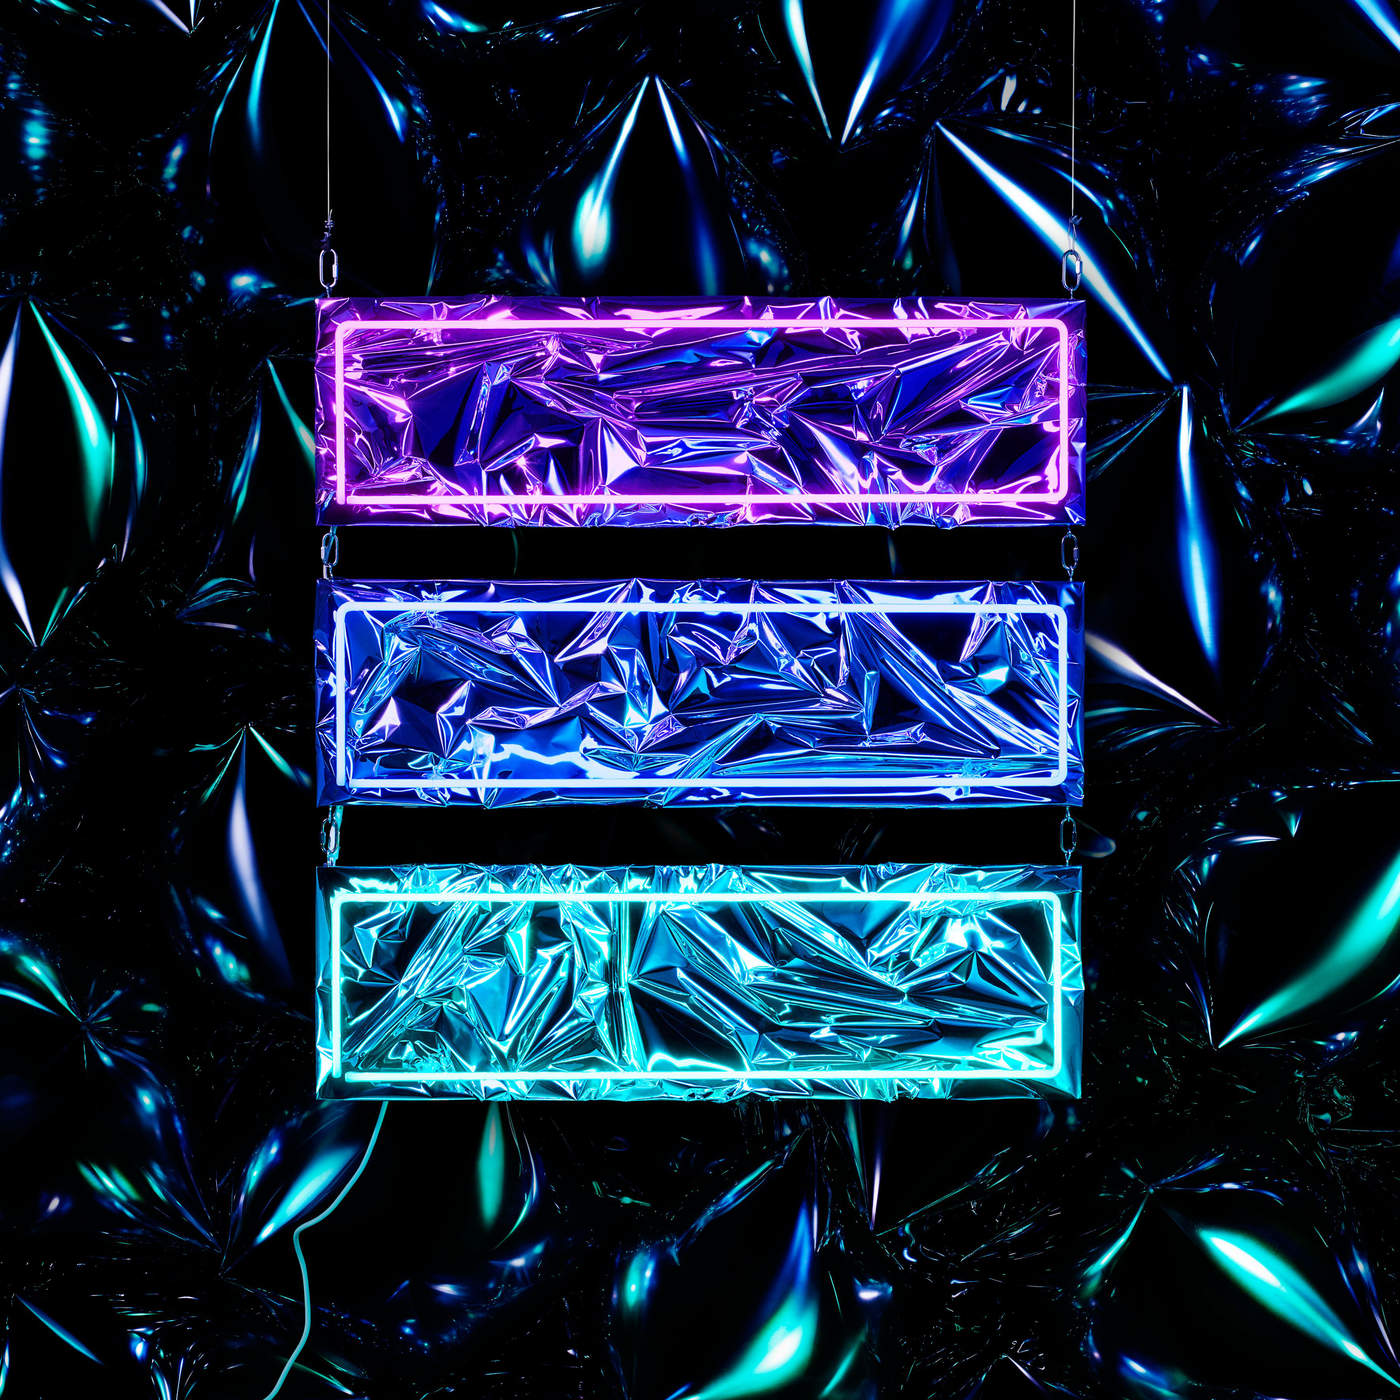 Two Door Cinema Club - Gameshow (Deluxe Edition) Cover